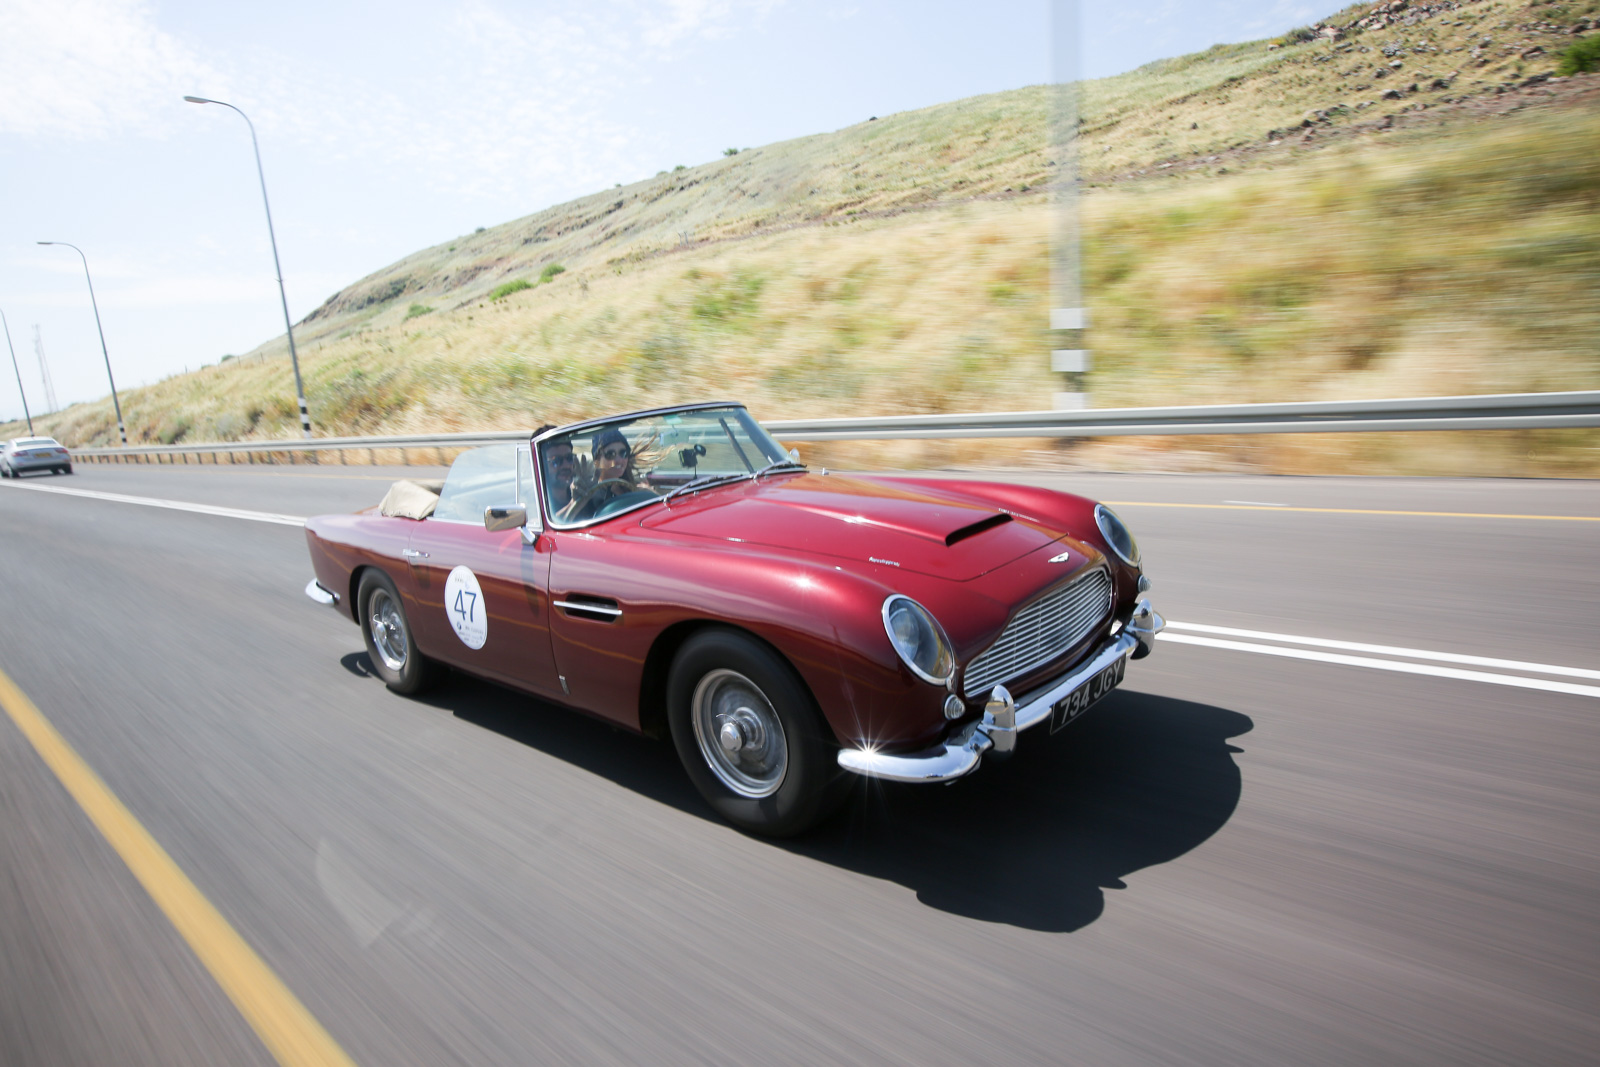 Aston Martin DB5 Convertible 1963, Argentina